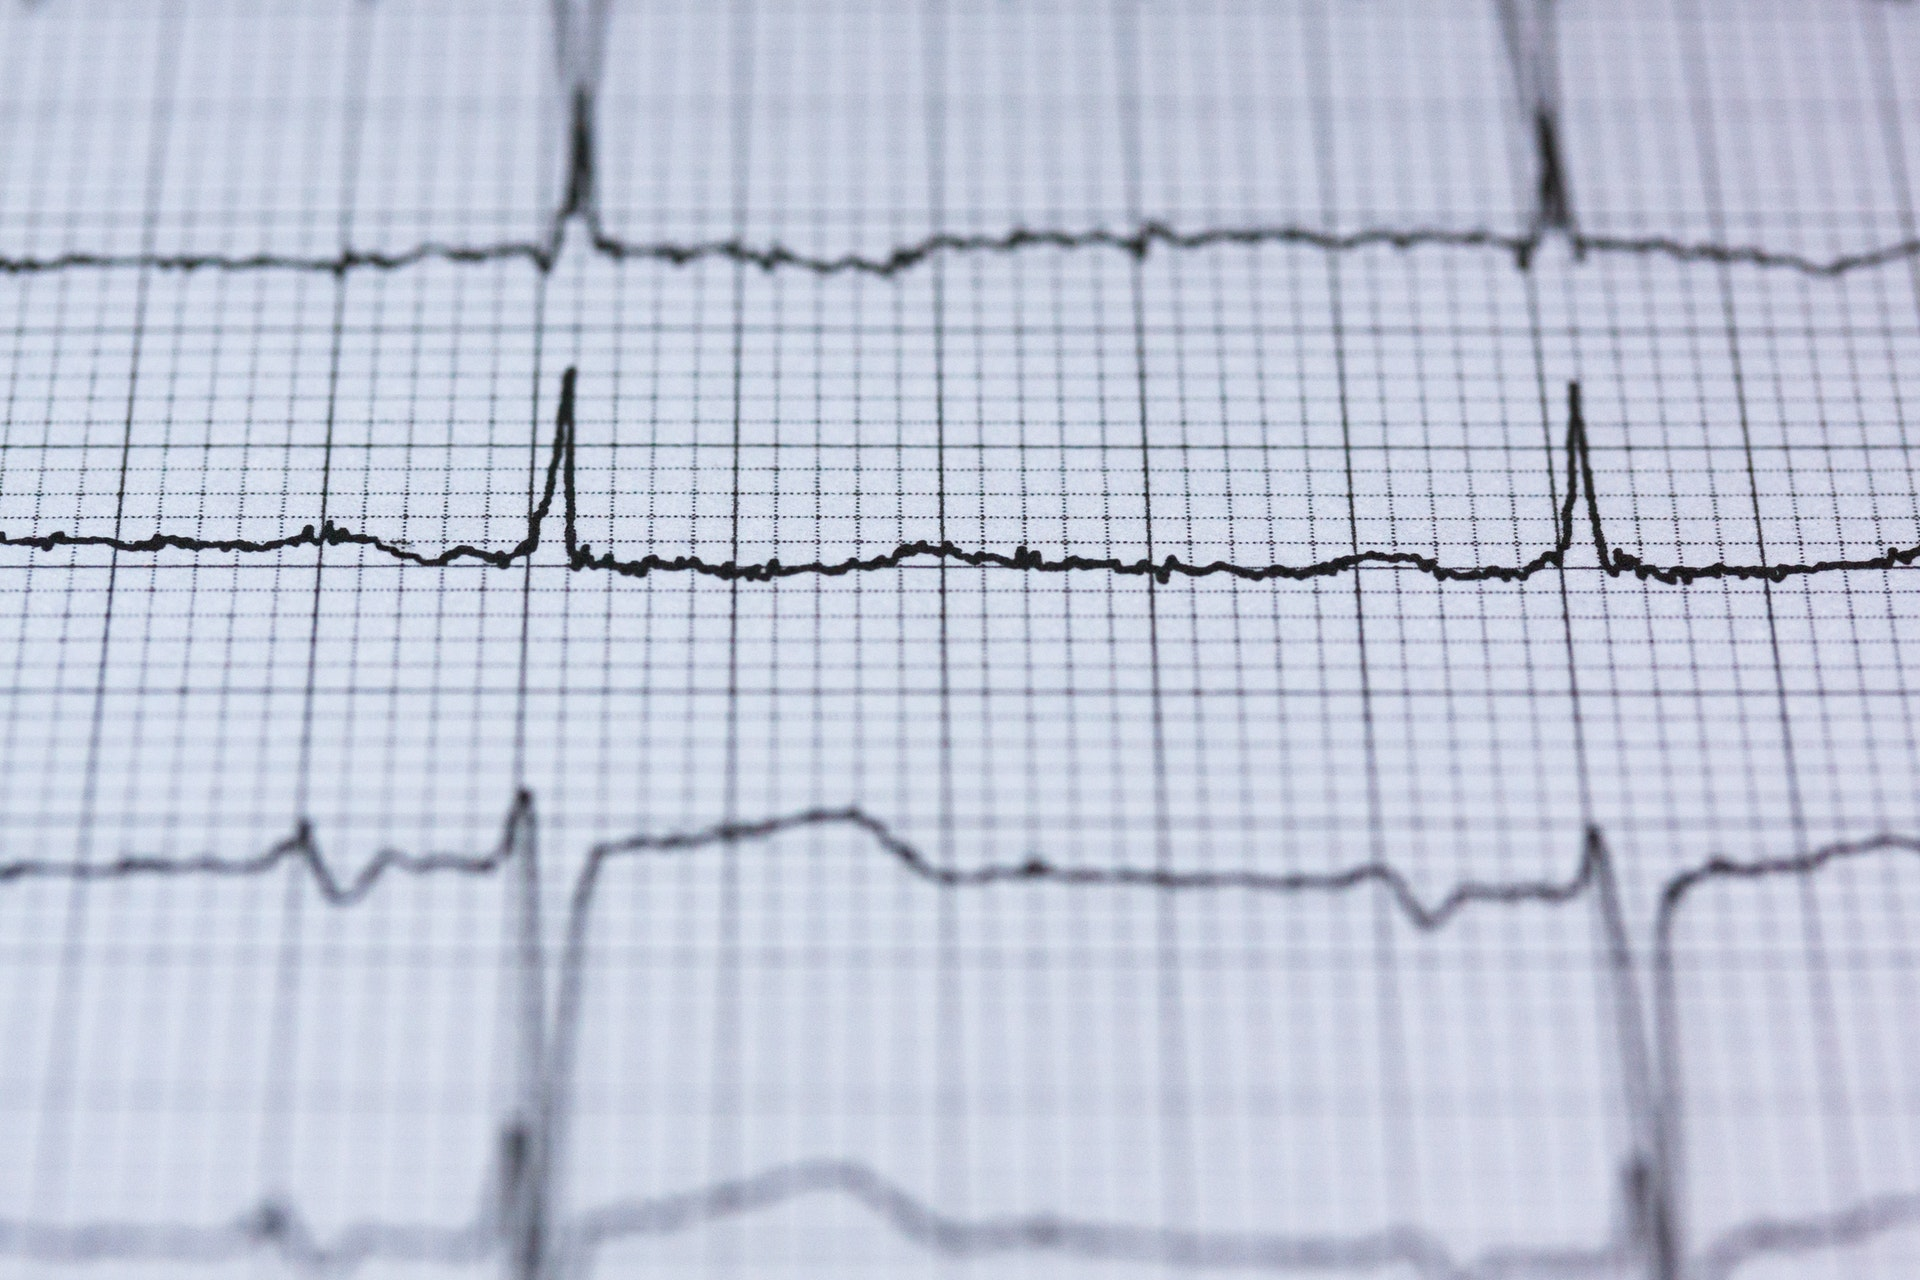 Síndrome coronario agudo con elevación del segmento S-T: fisiopatología y criterios diagnósticos